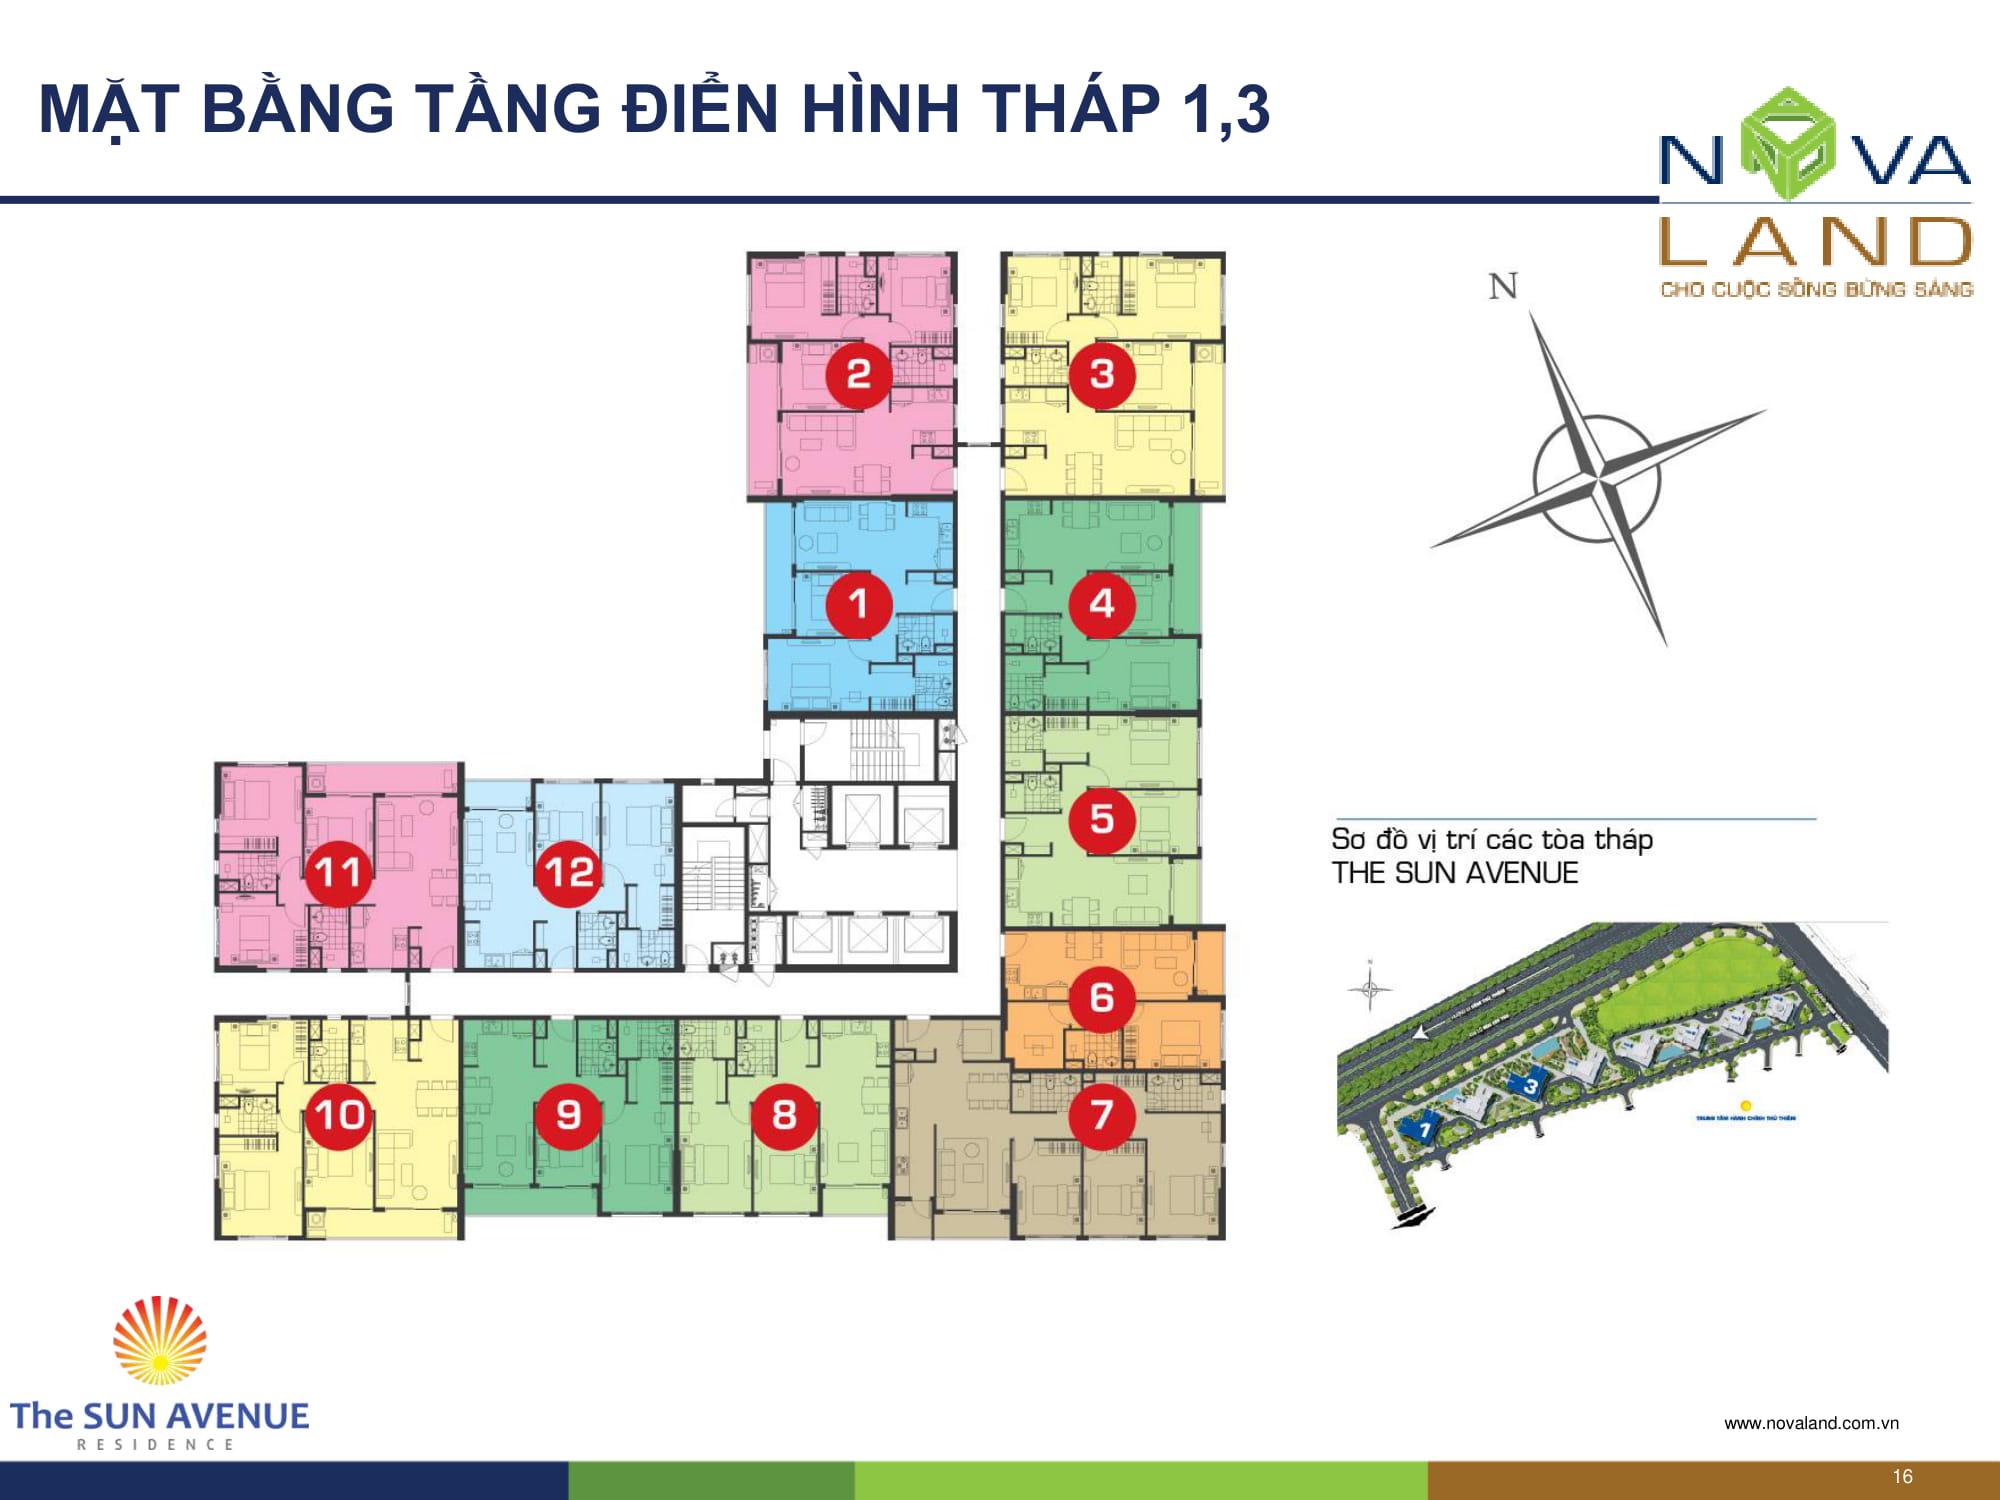 mat-bang-thap-1-3-the-sun-avenue